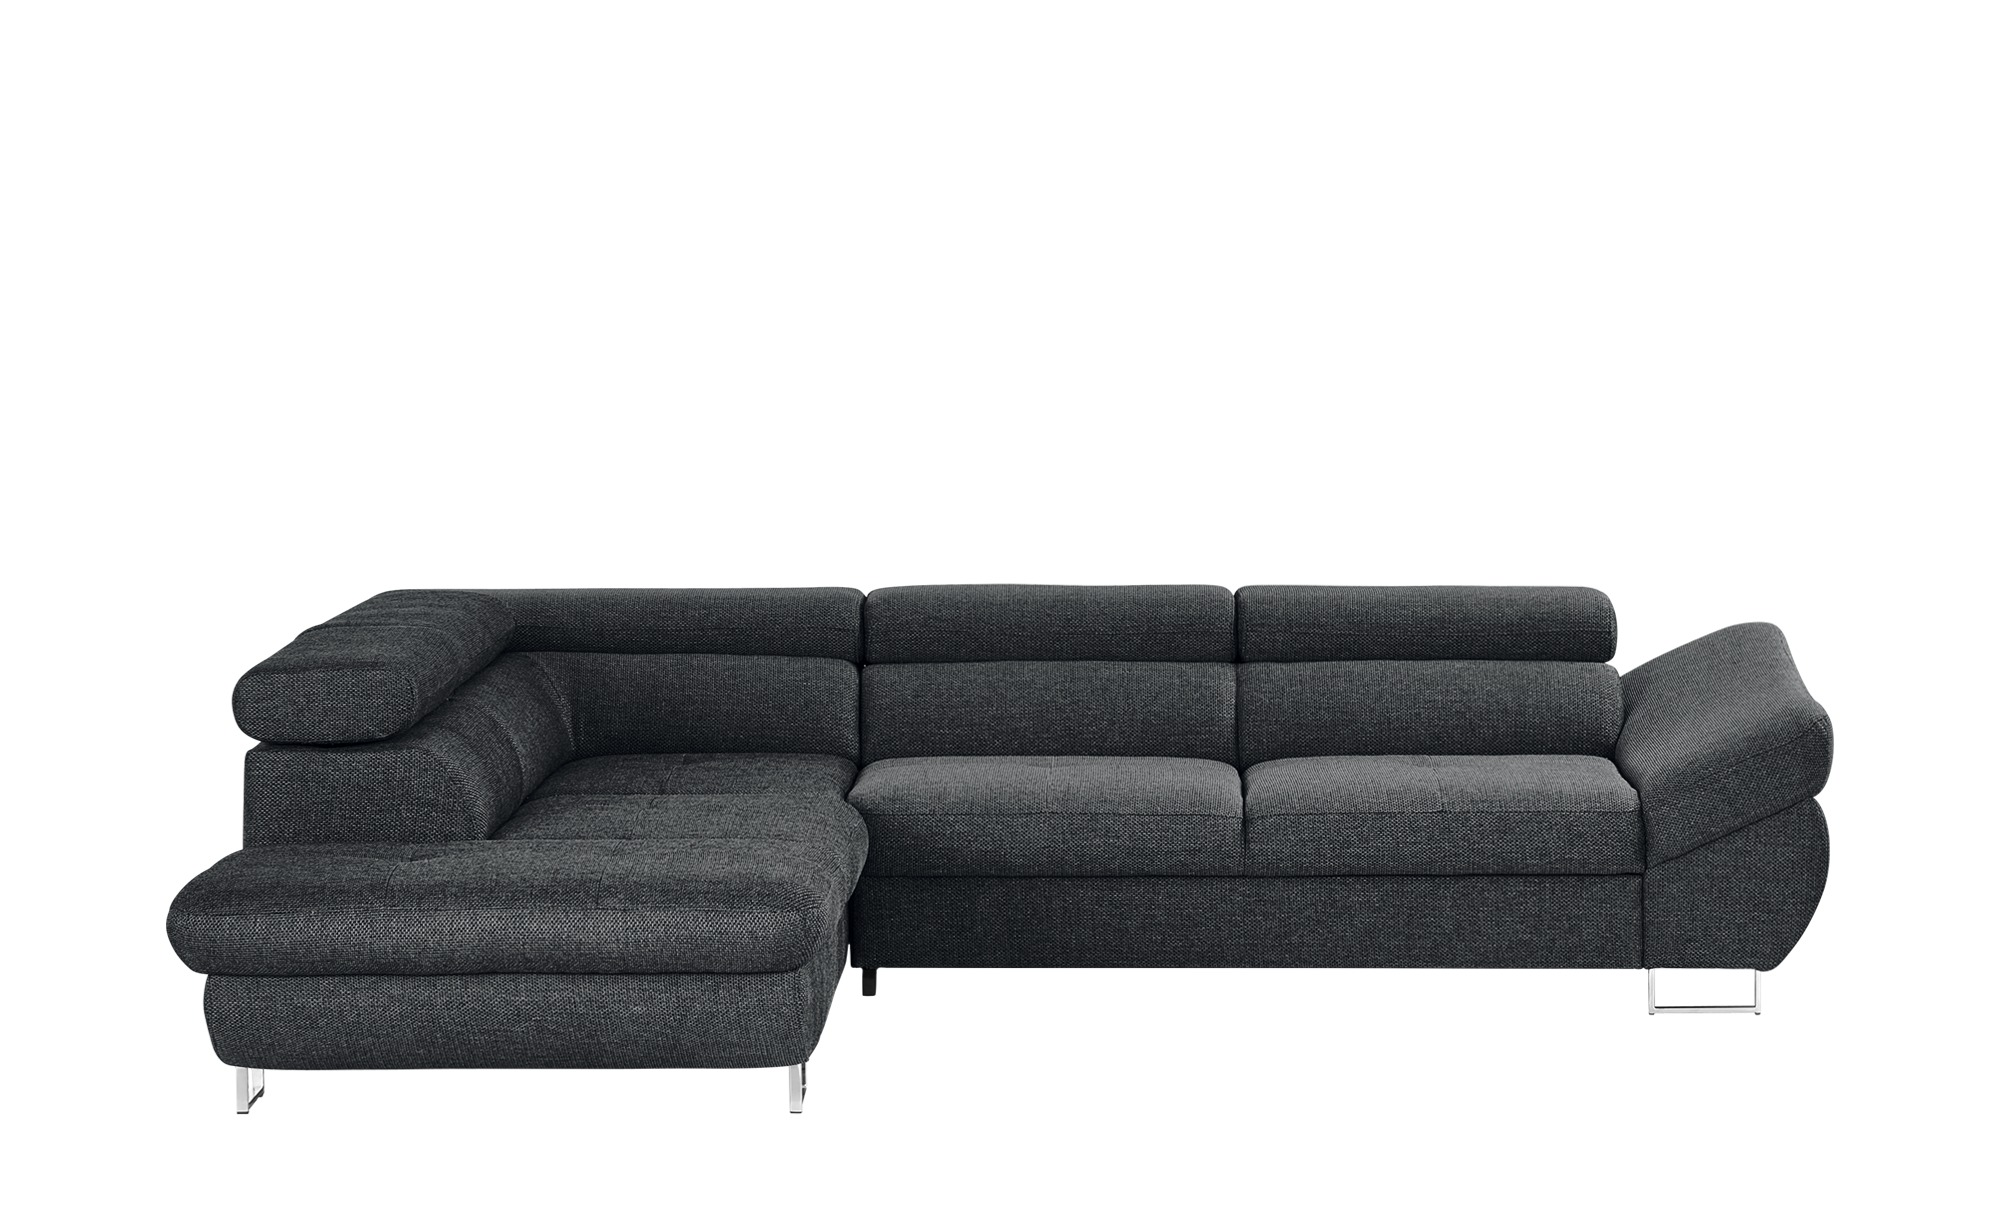 Switch Ecksofa Fabio Gefunden Bei Mobel Hoffner Ecksofa Sofa Billige Couch